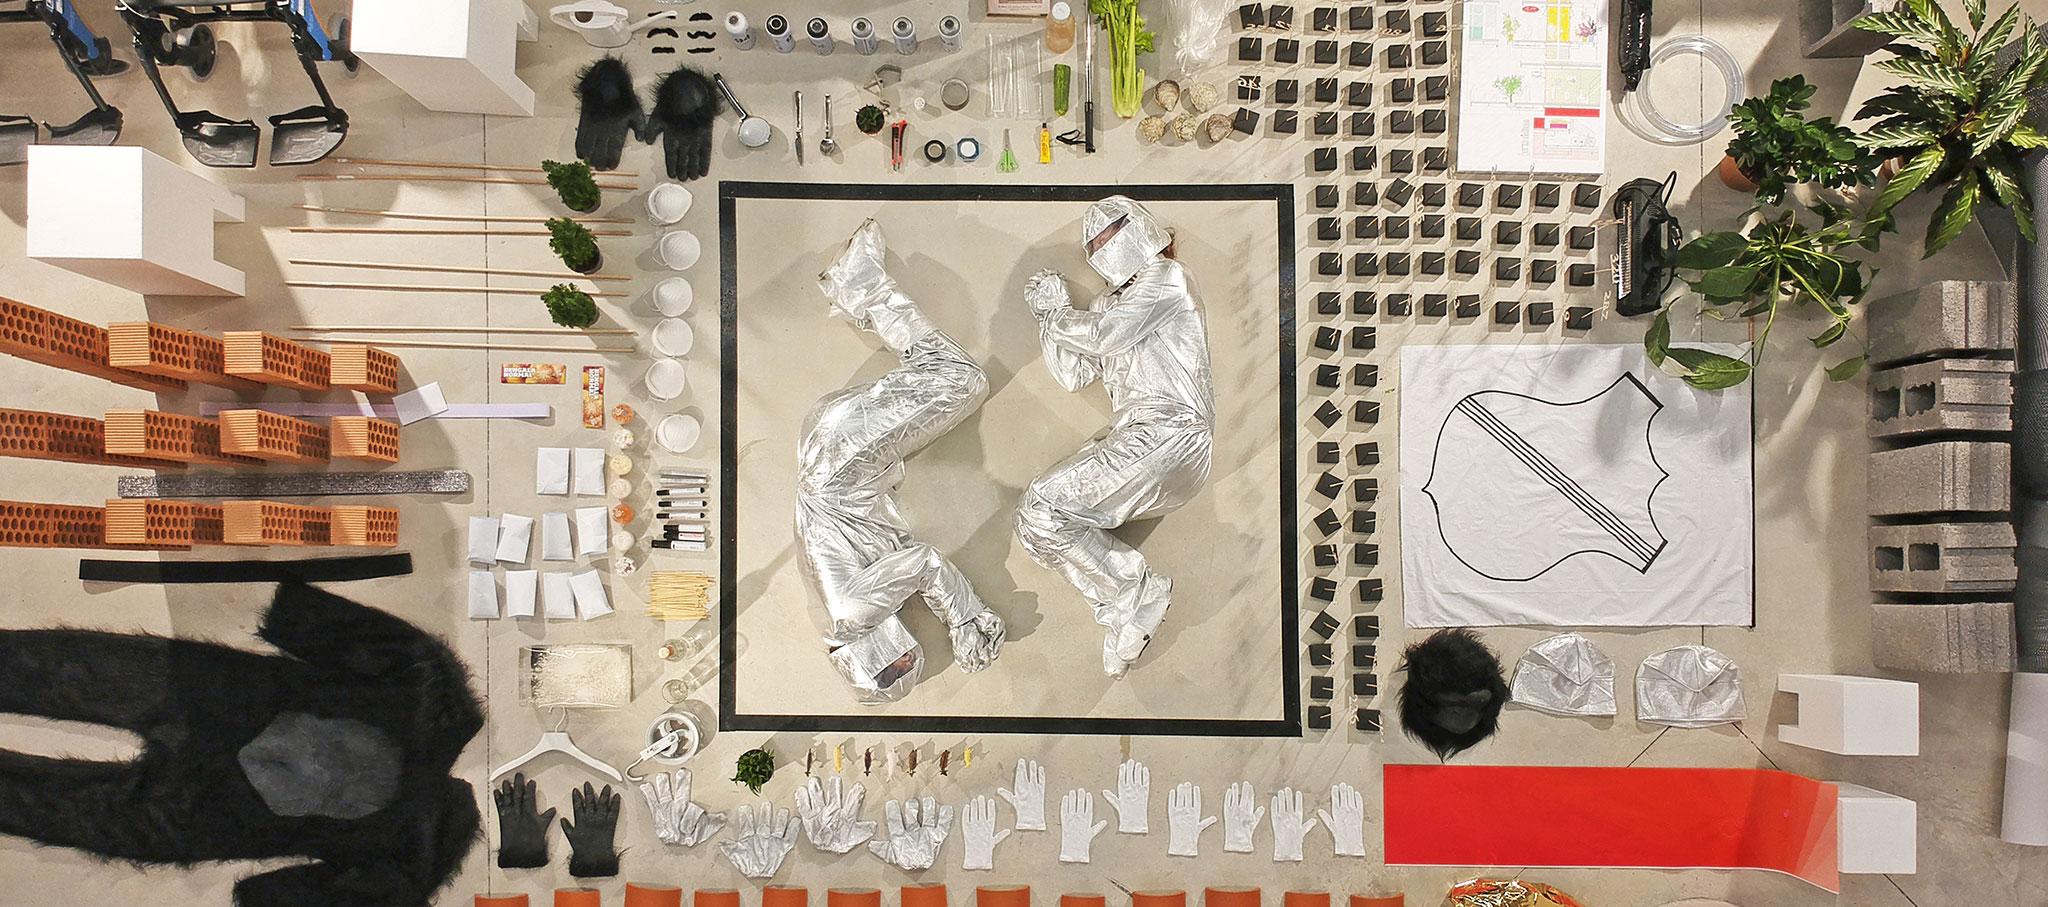 Teaser dron. A Fine Line: Scenarios for bordering conditions en la I Bienal Internacional de Arquitectura de Euskadi MUGAK. Imagen cortesía de A Fine Line BIASS'17